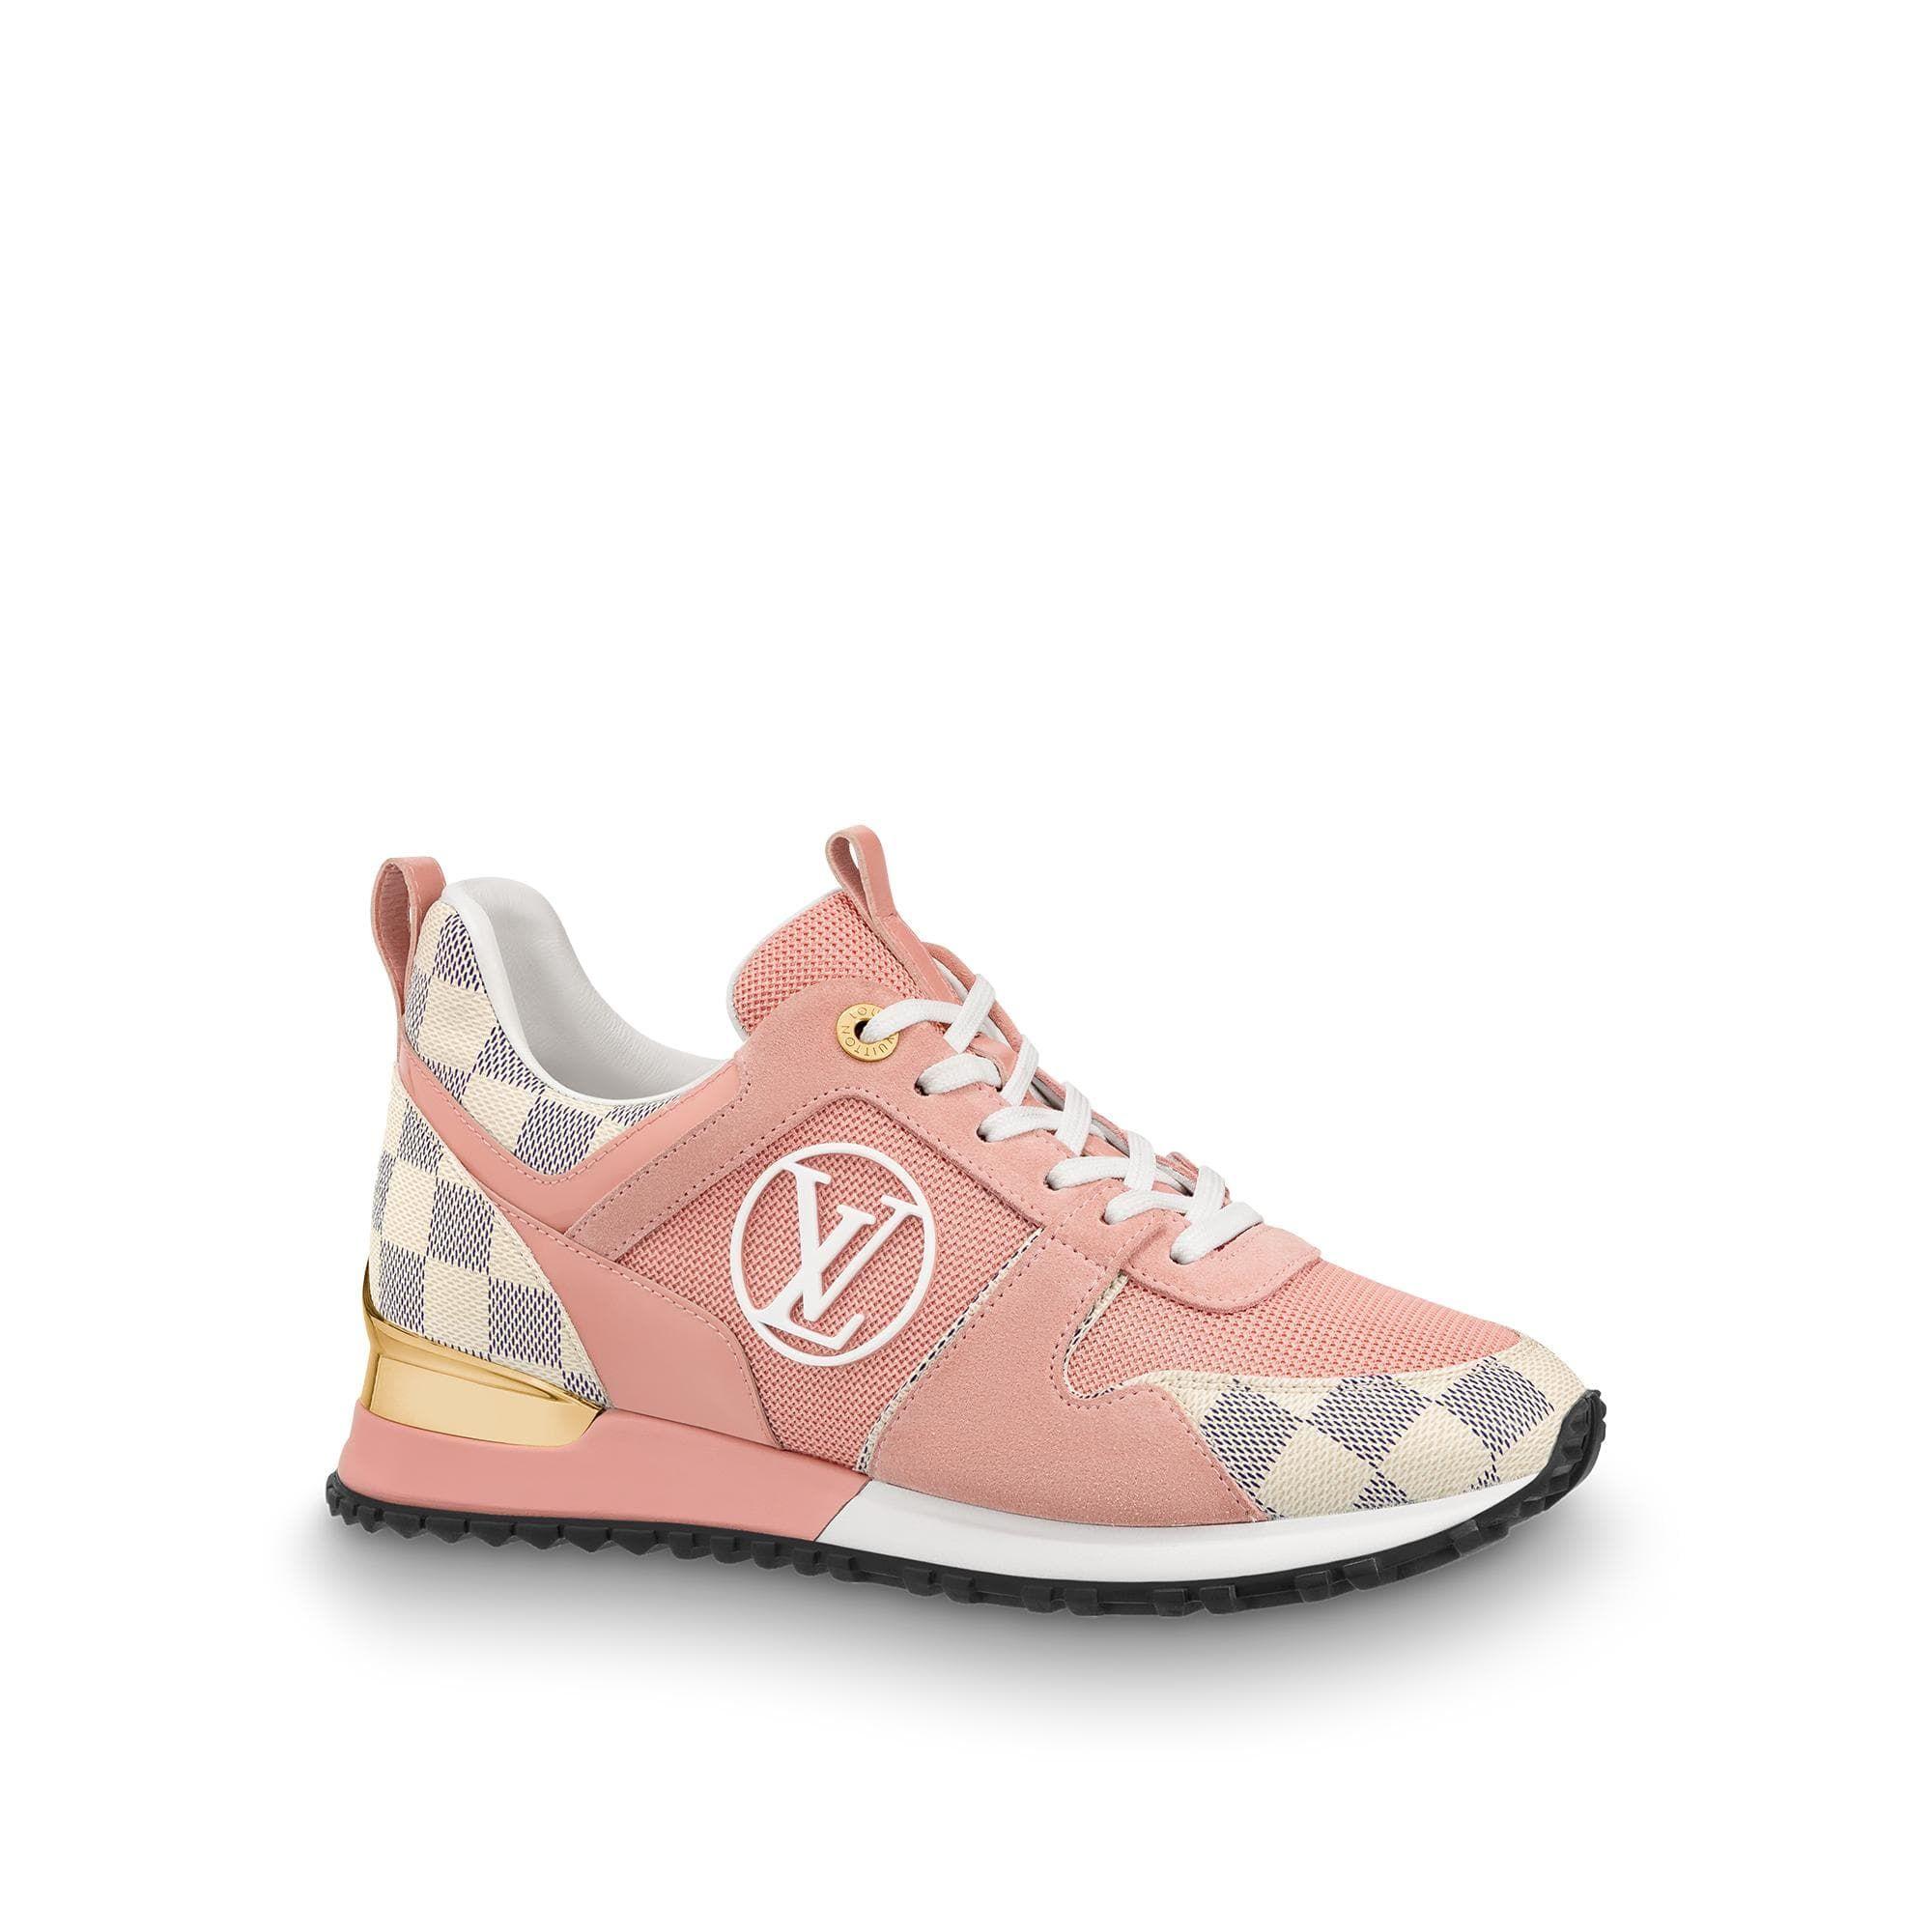 wholesale dealer 14979 79187 Designer Sneakers for Women - LOUIS VUITTON ®   Style in 2019   Louis  vuitton sneakers, Louis vuitton sneakers women, Sneakers